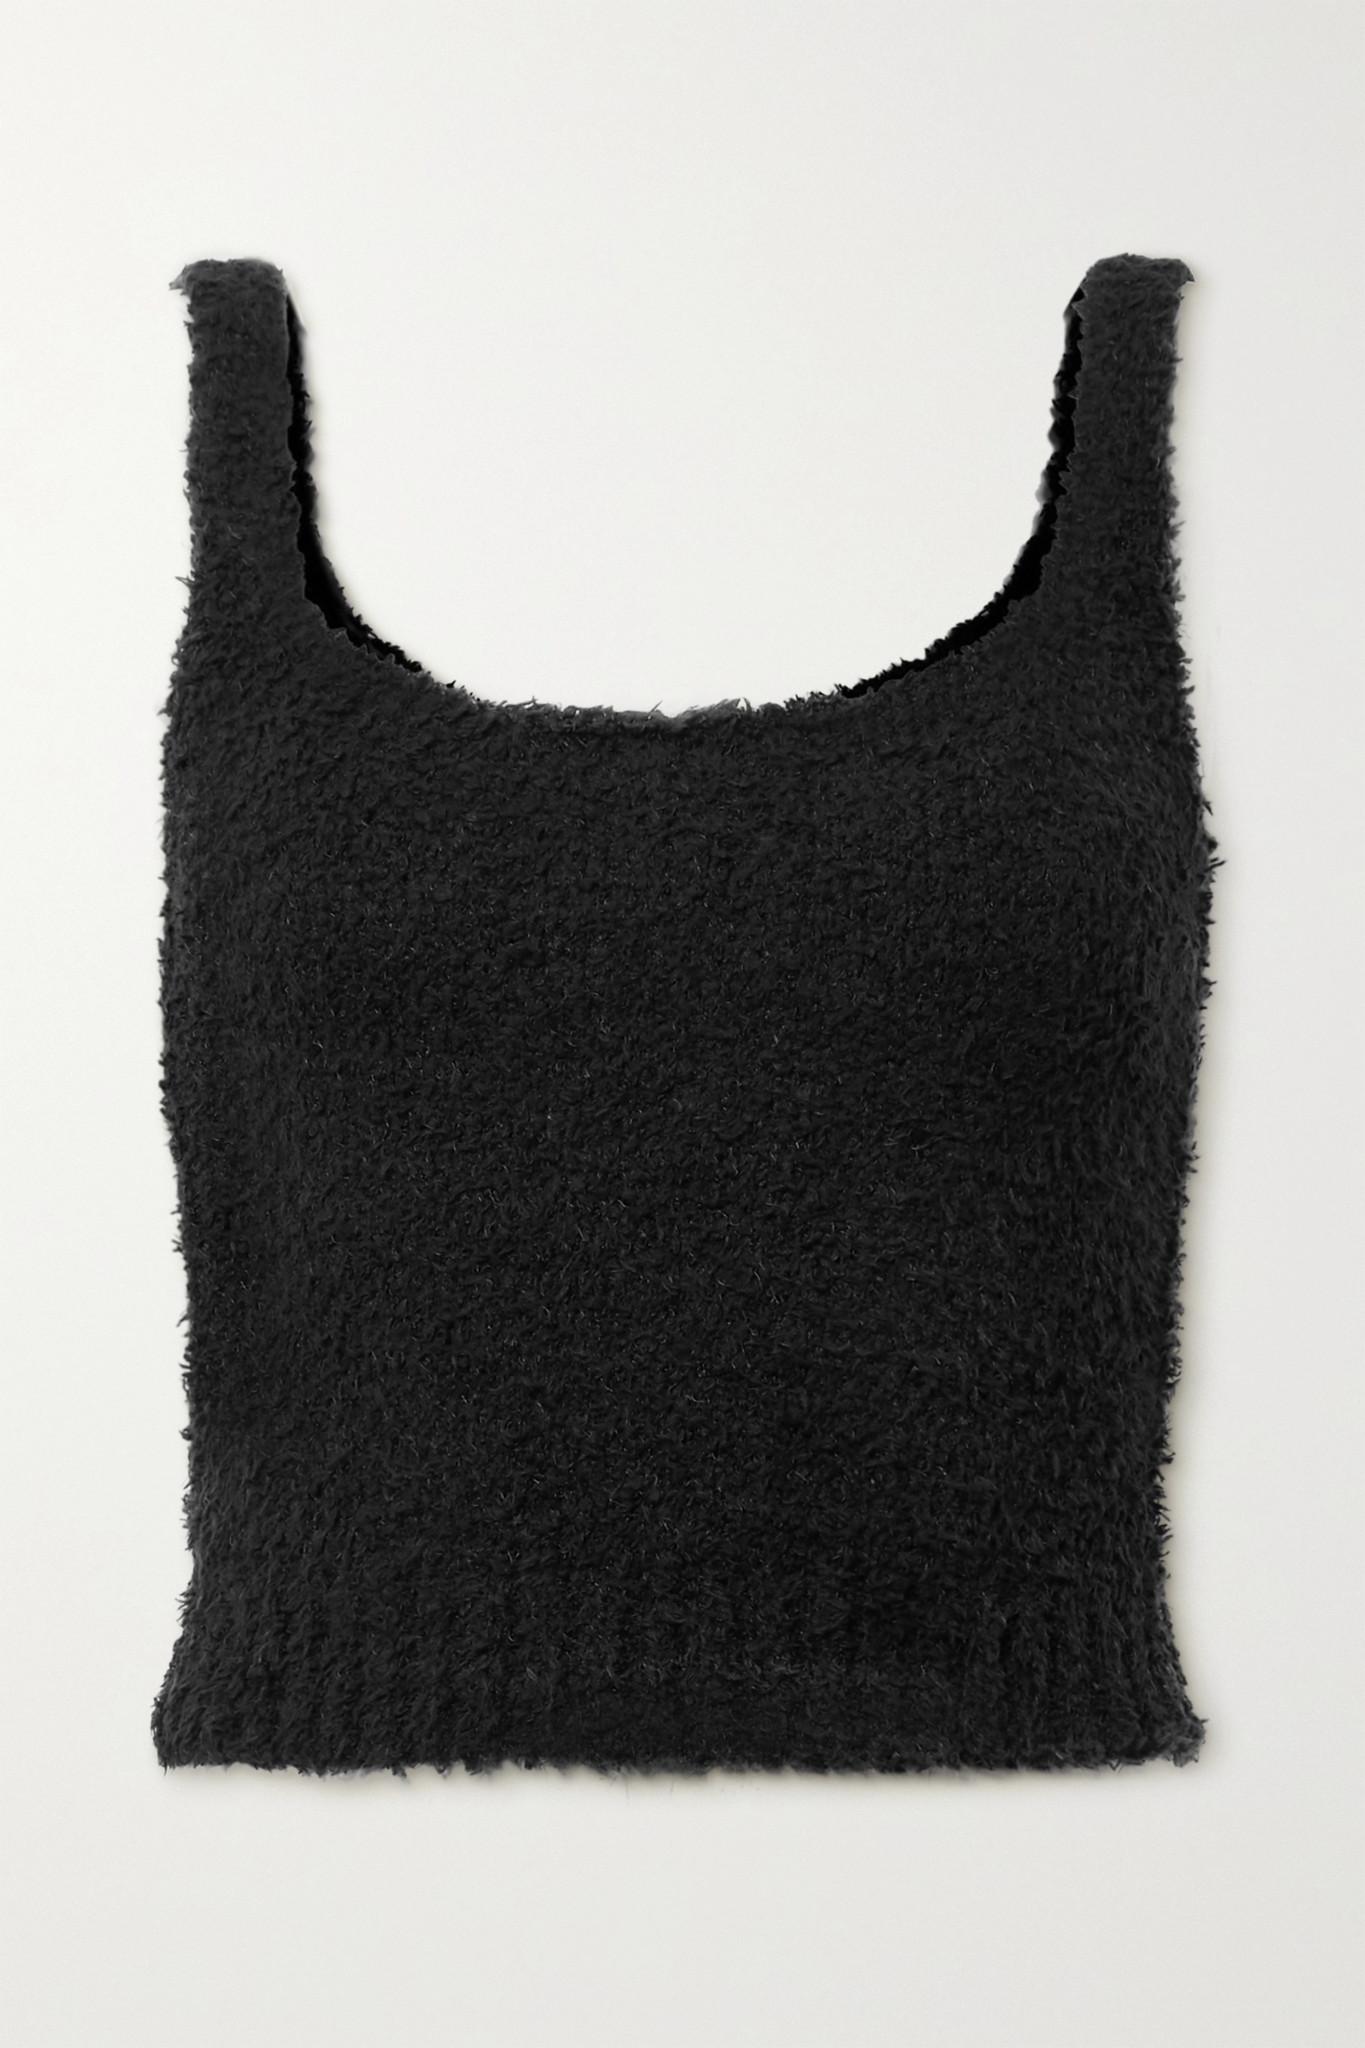 SKIMS - Cozy Knit Bouclé Tank - Onyx - Black - S/M